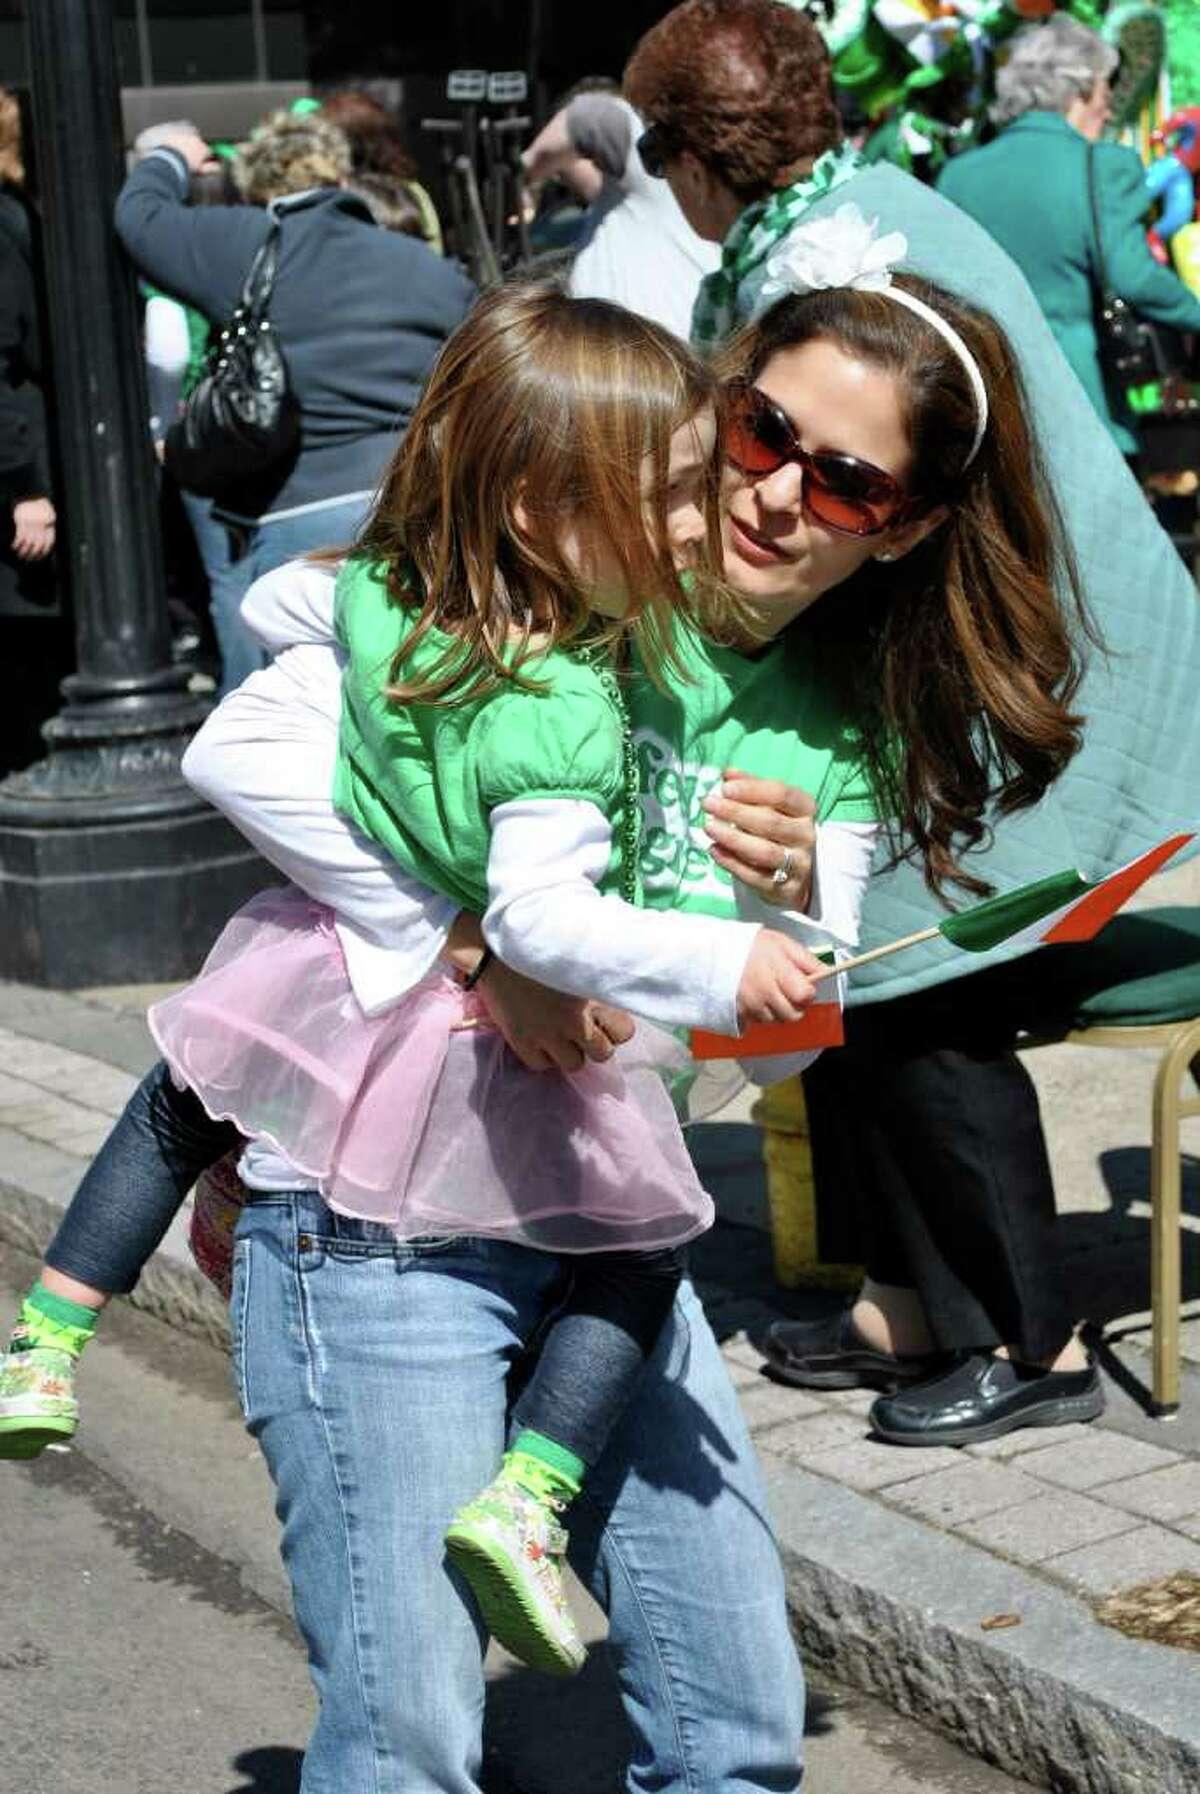 Bridgeport's St. Patrick's Day Parade on Thursday March 17, 2011.